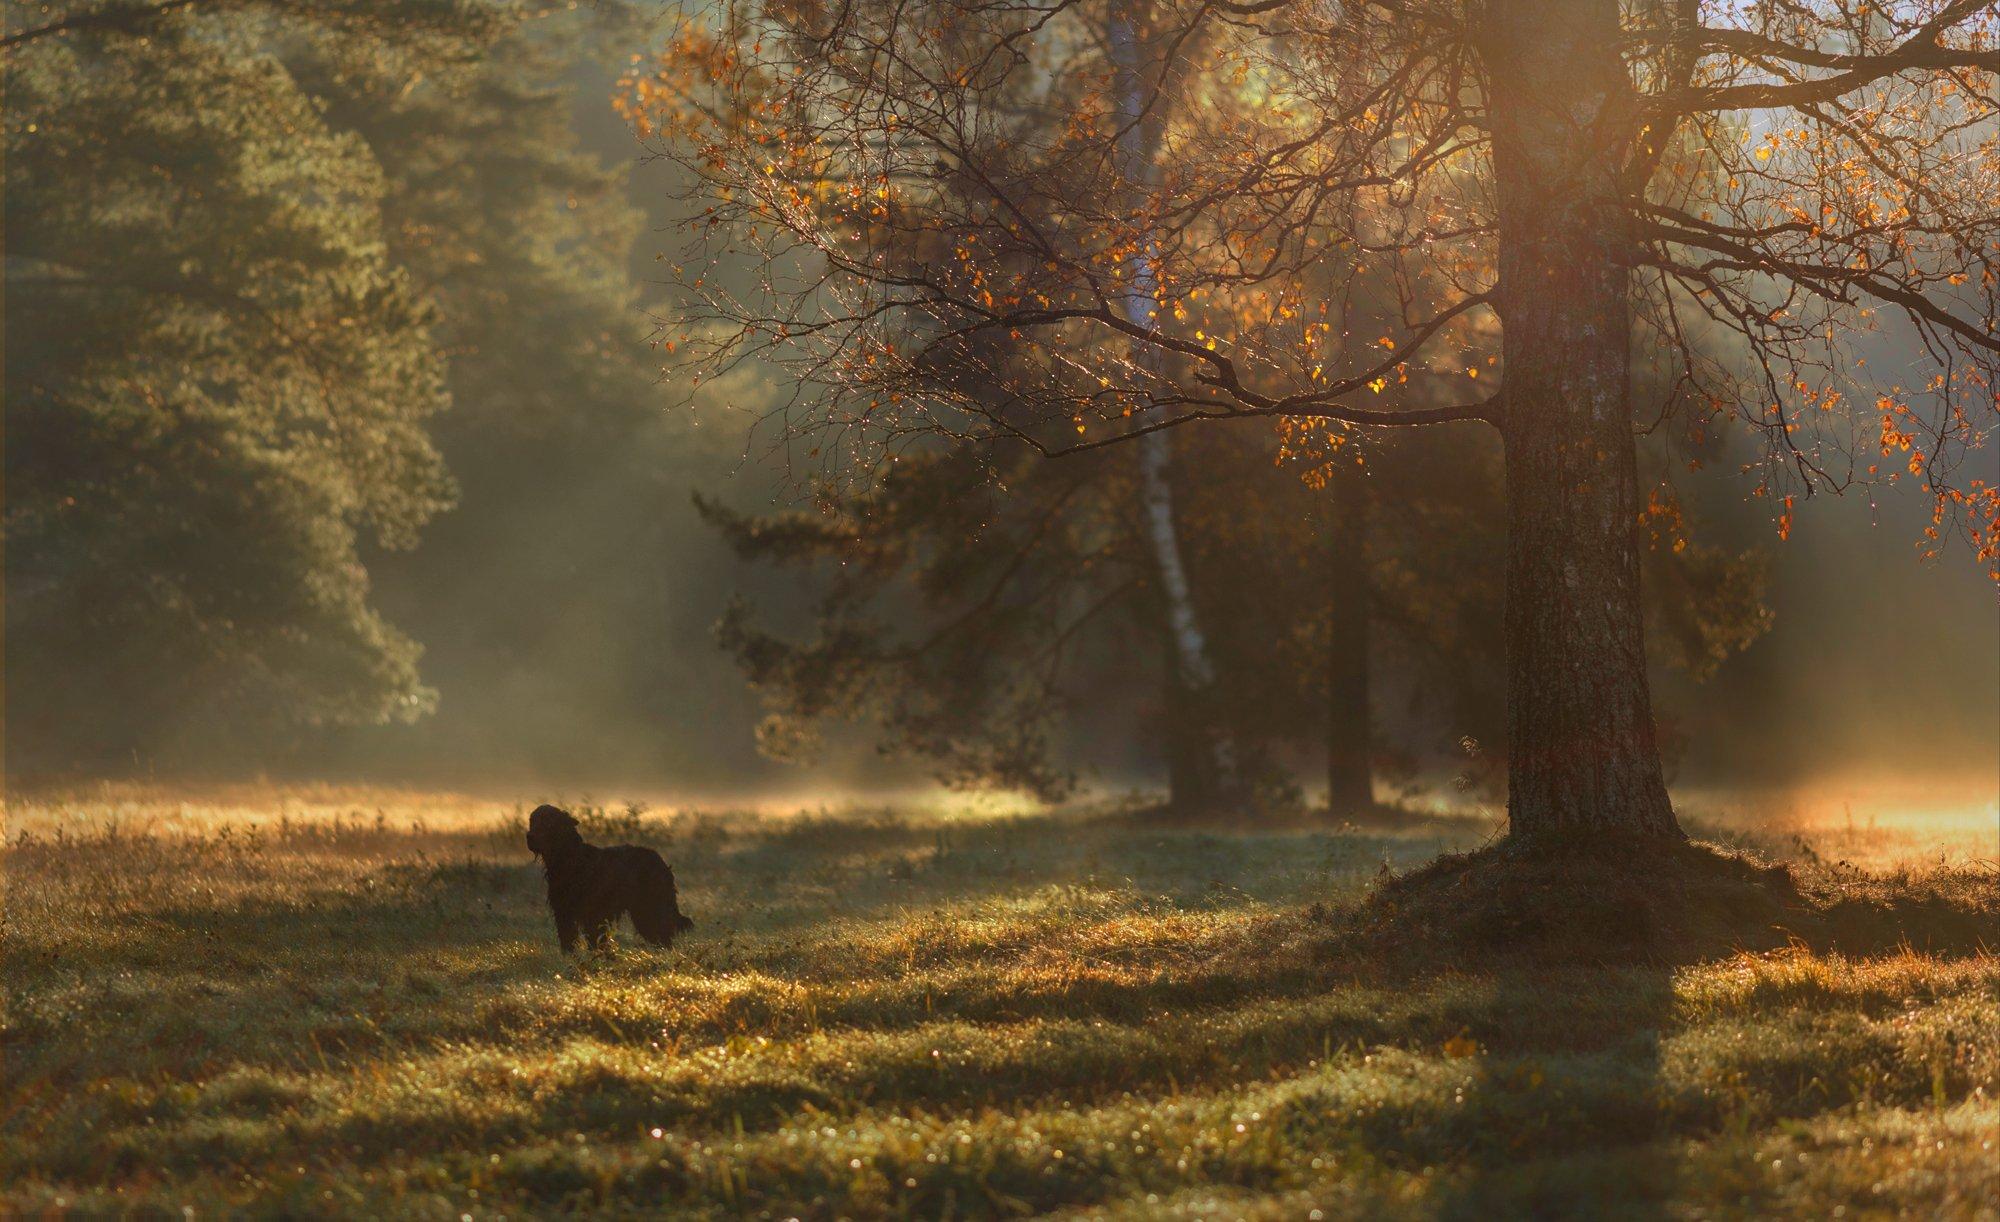 питер, павловск. павловскийпарк, пейзаж, Таня She (Aiya)